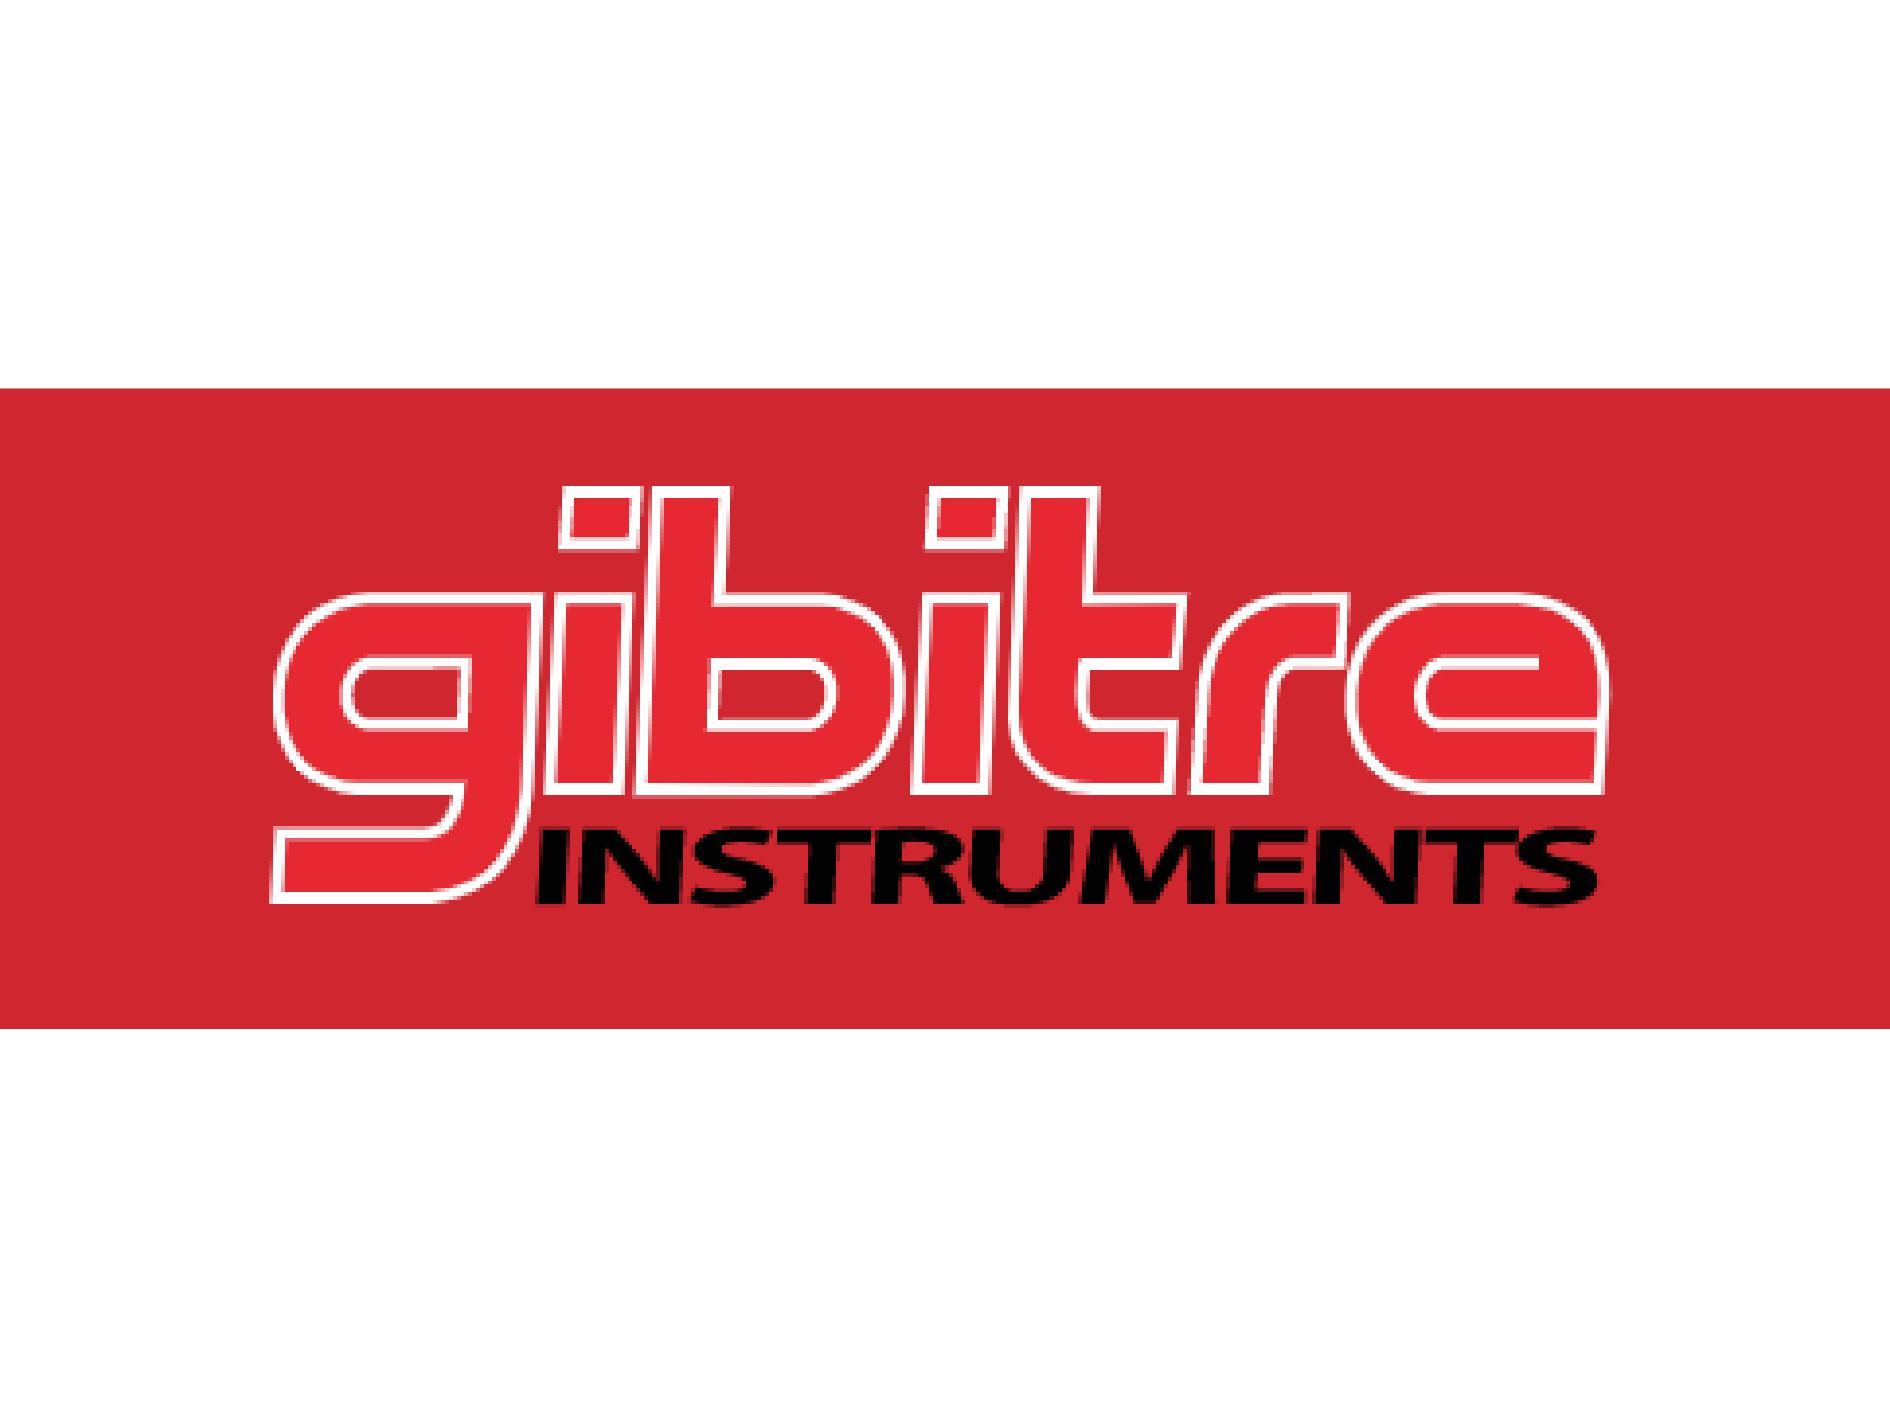 義大利Gibitre